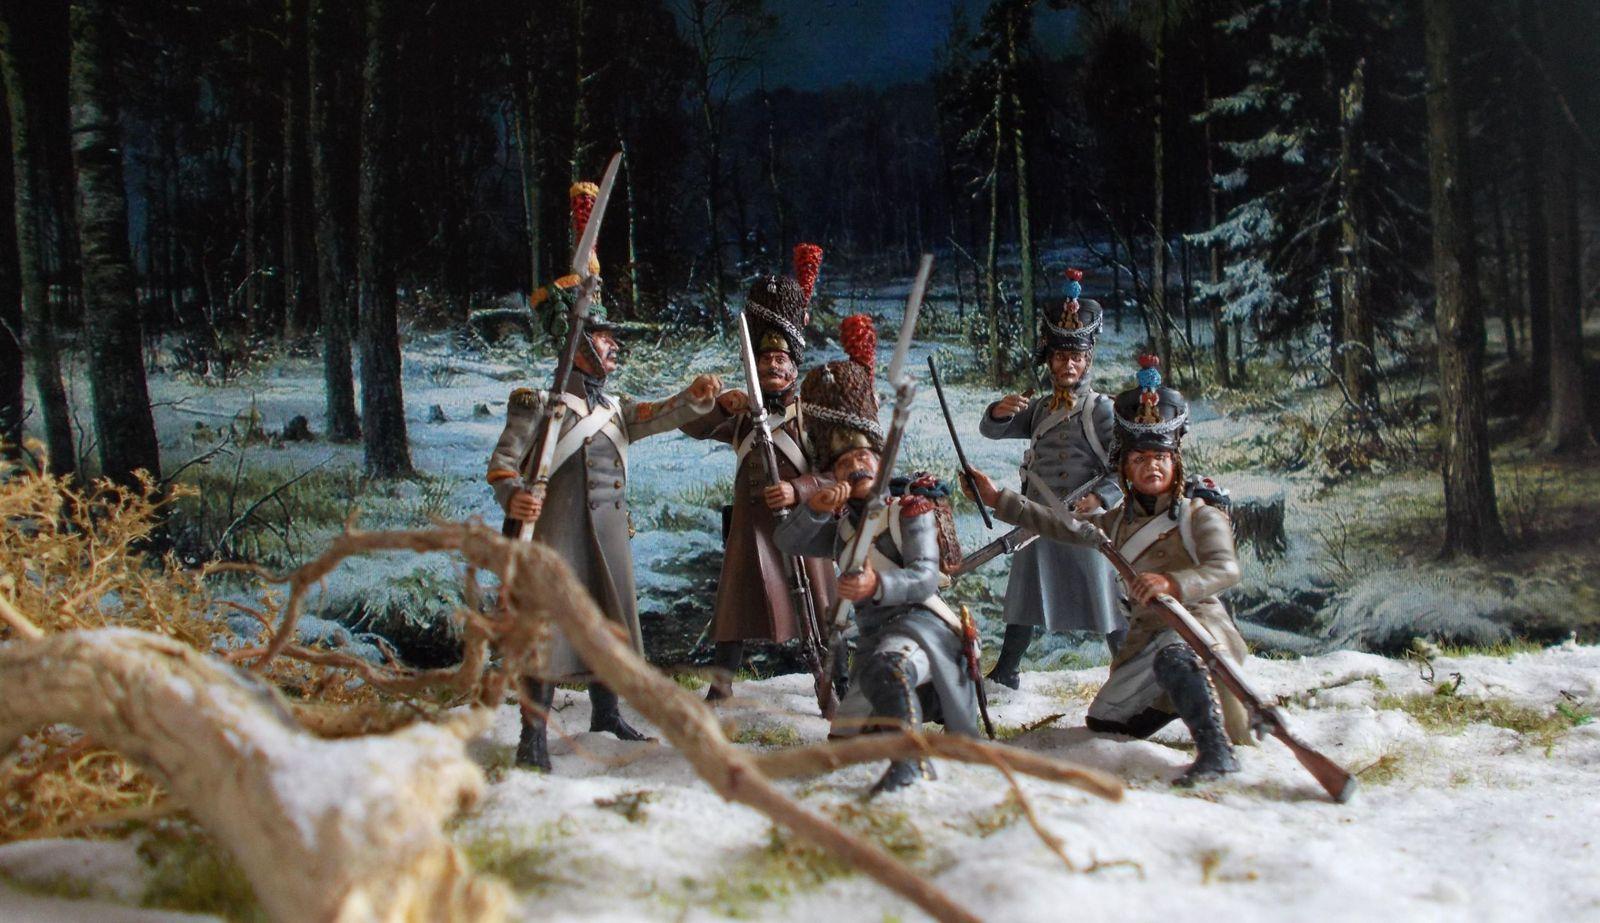 RETRAITE DE RUSSIE ........1812